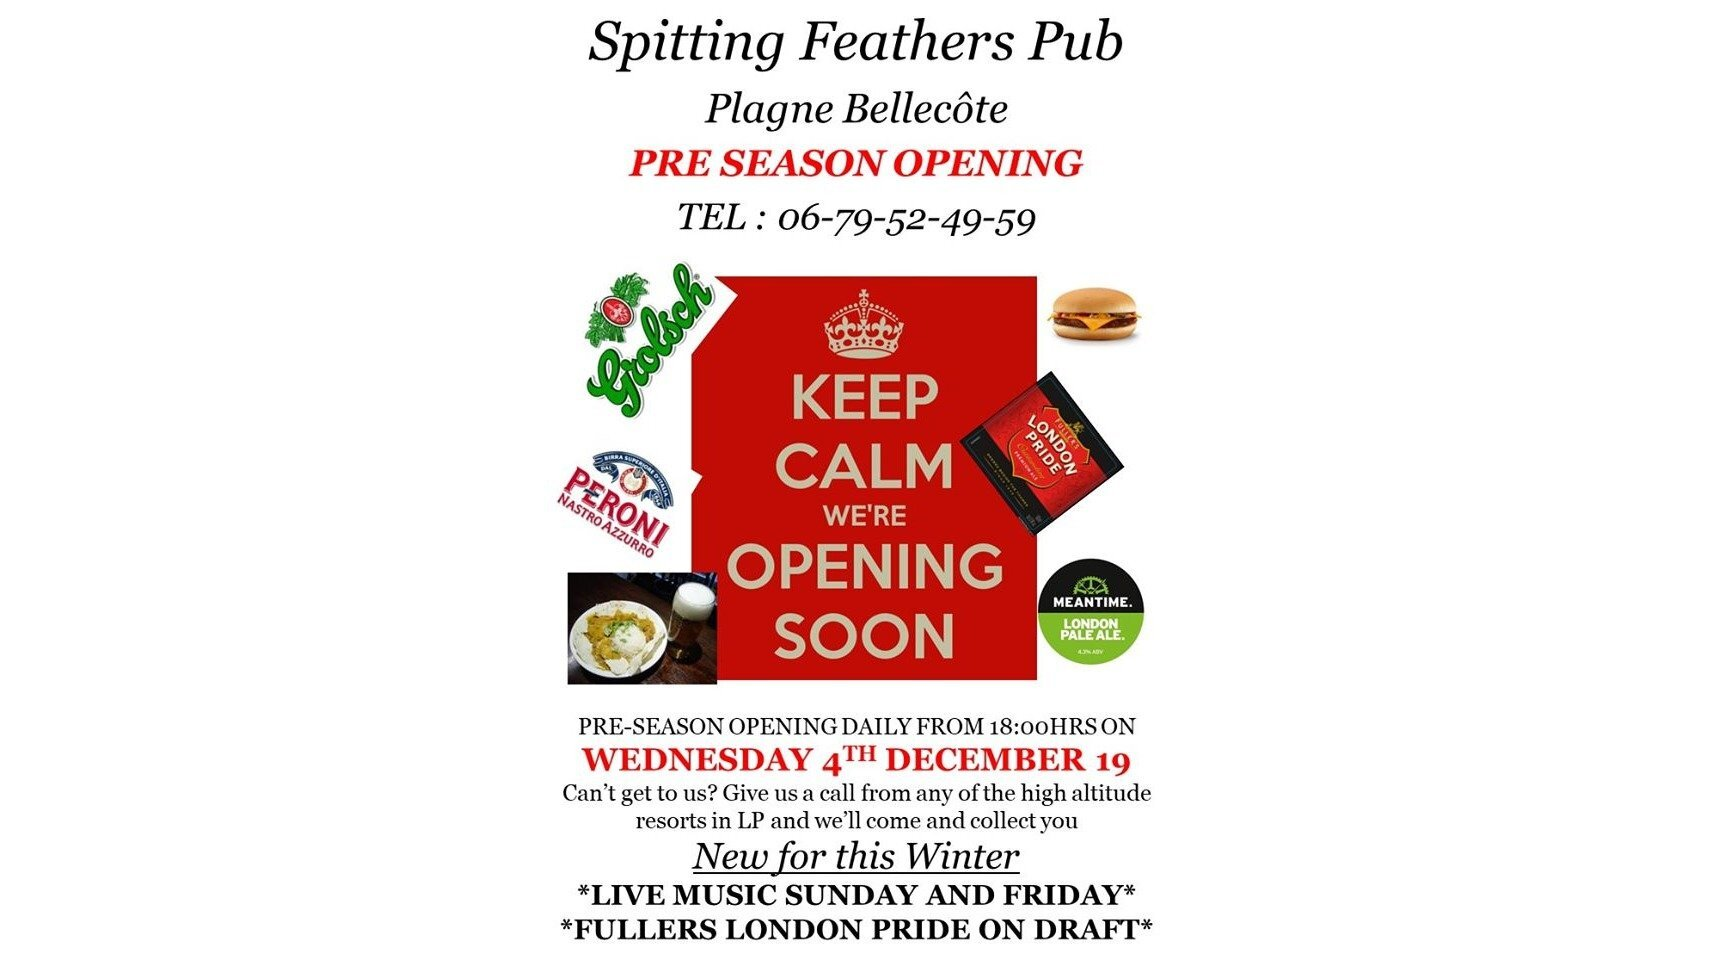 Pre-season opening at Spitting Feathers, La Plagne